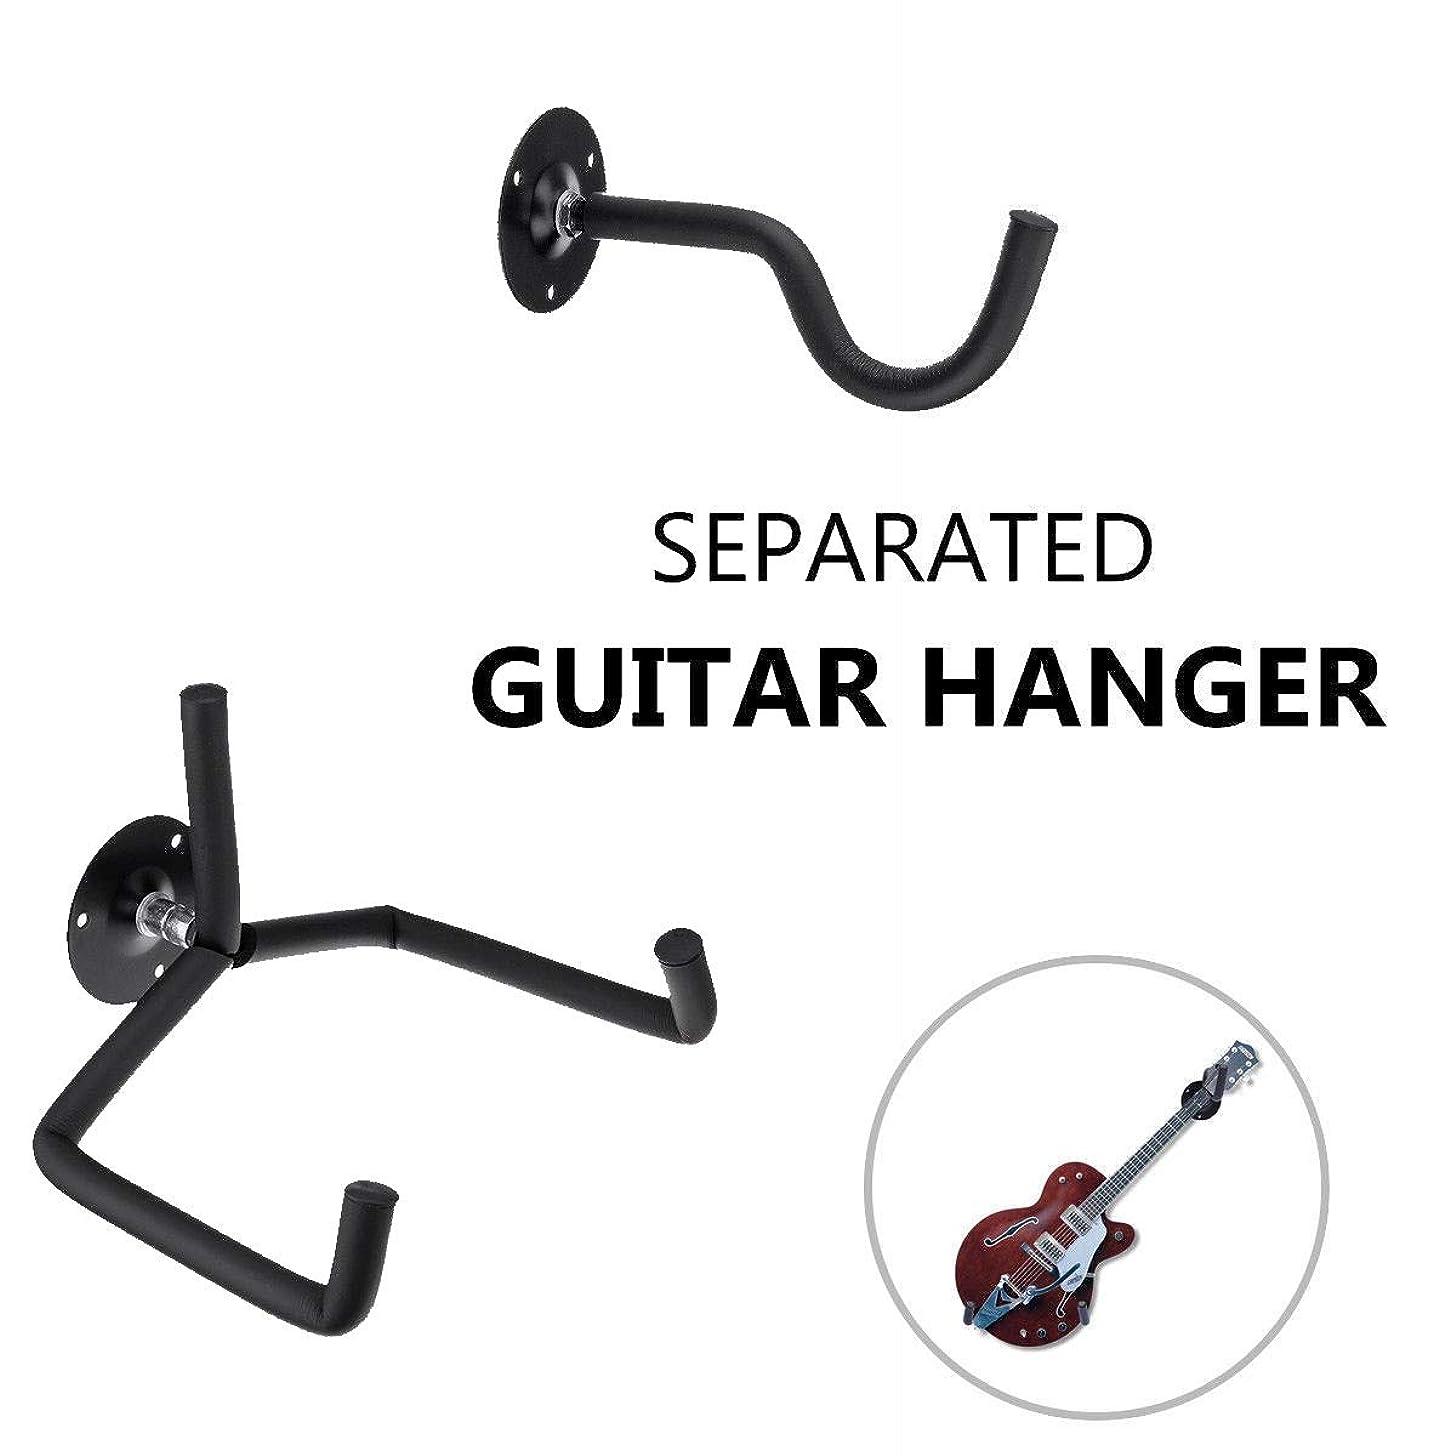 Bewox Guitar Display Hanger Holder Wall Mount Hook For Horizontal Guitars,Banjos, Basses, Mandolins